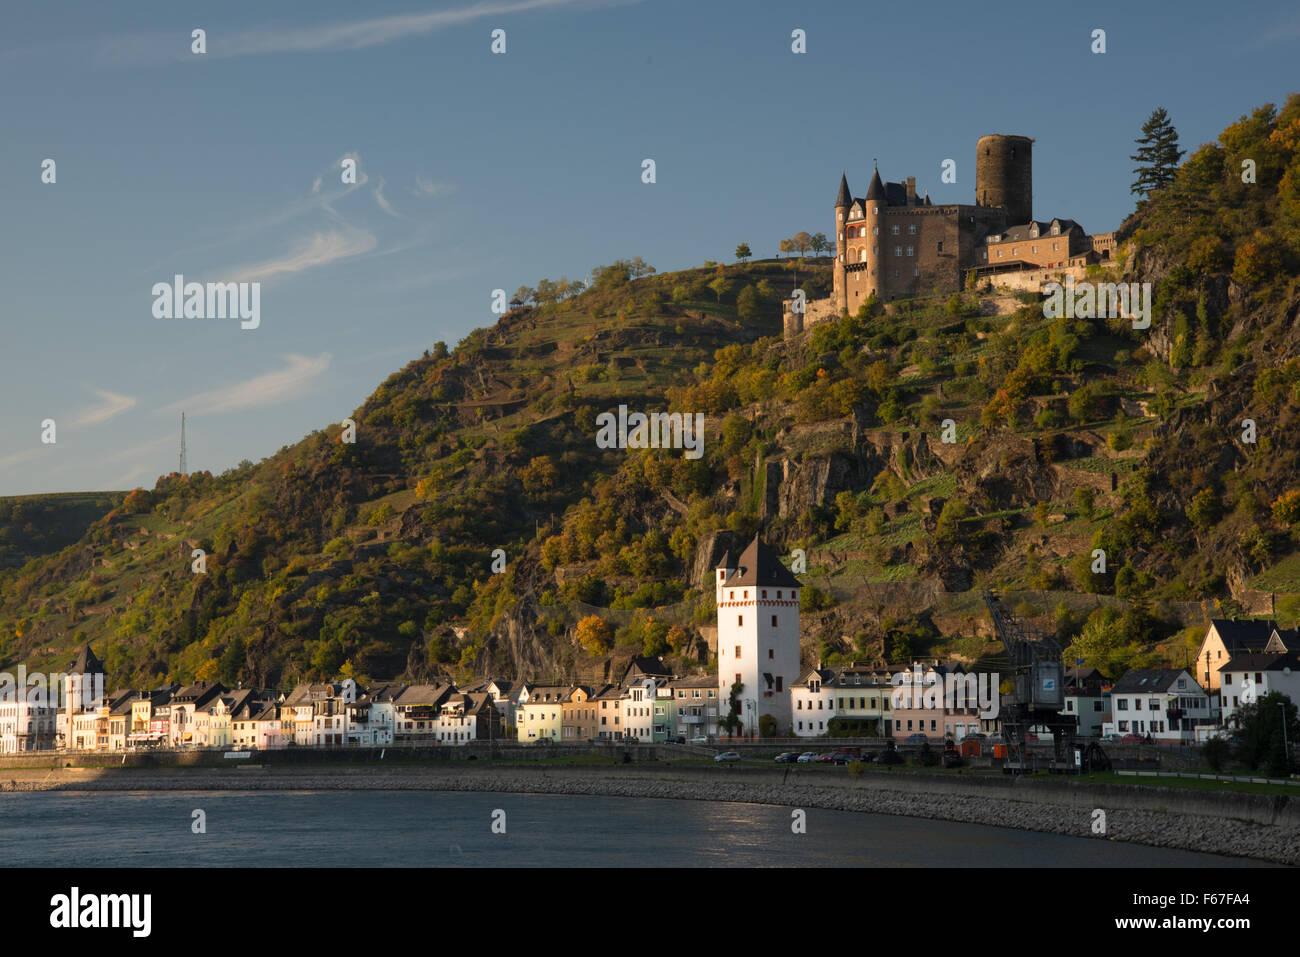 Rhine town of St Goarshausen at foot of Burg Katz castle Stock Photo